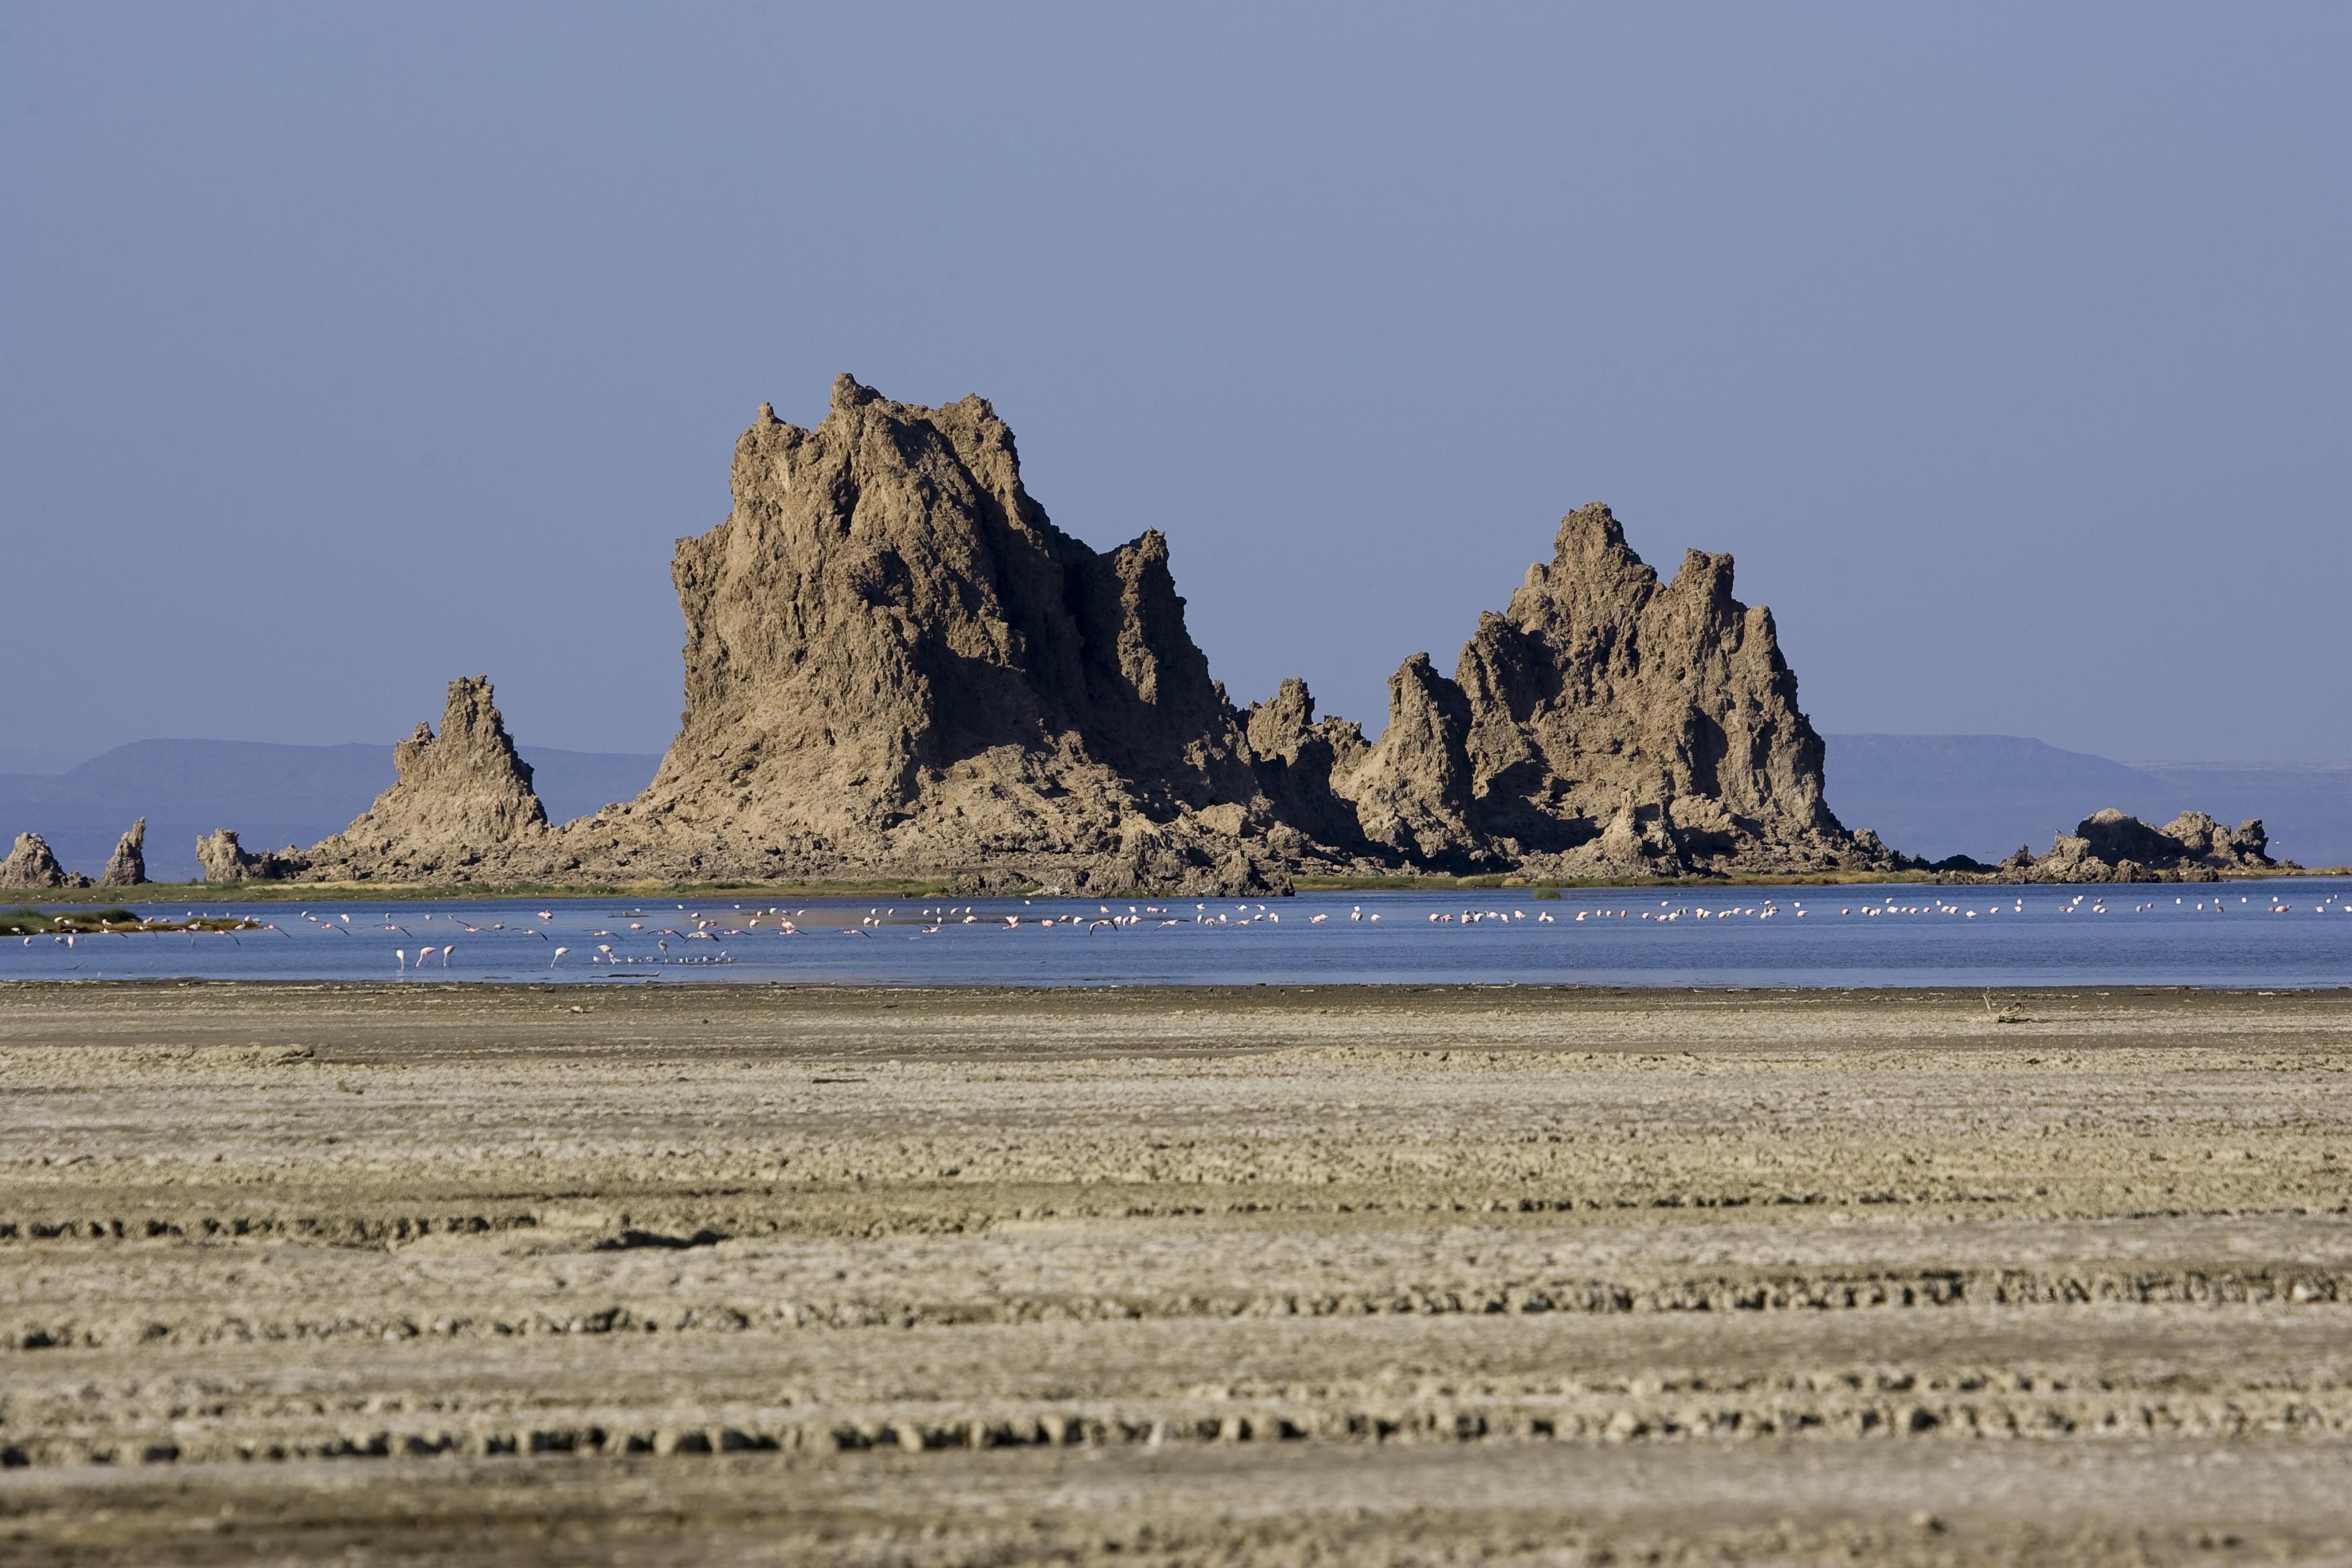 Lac Abbe Flamingos and Rock Formation, Djibouti